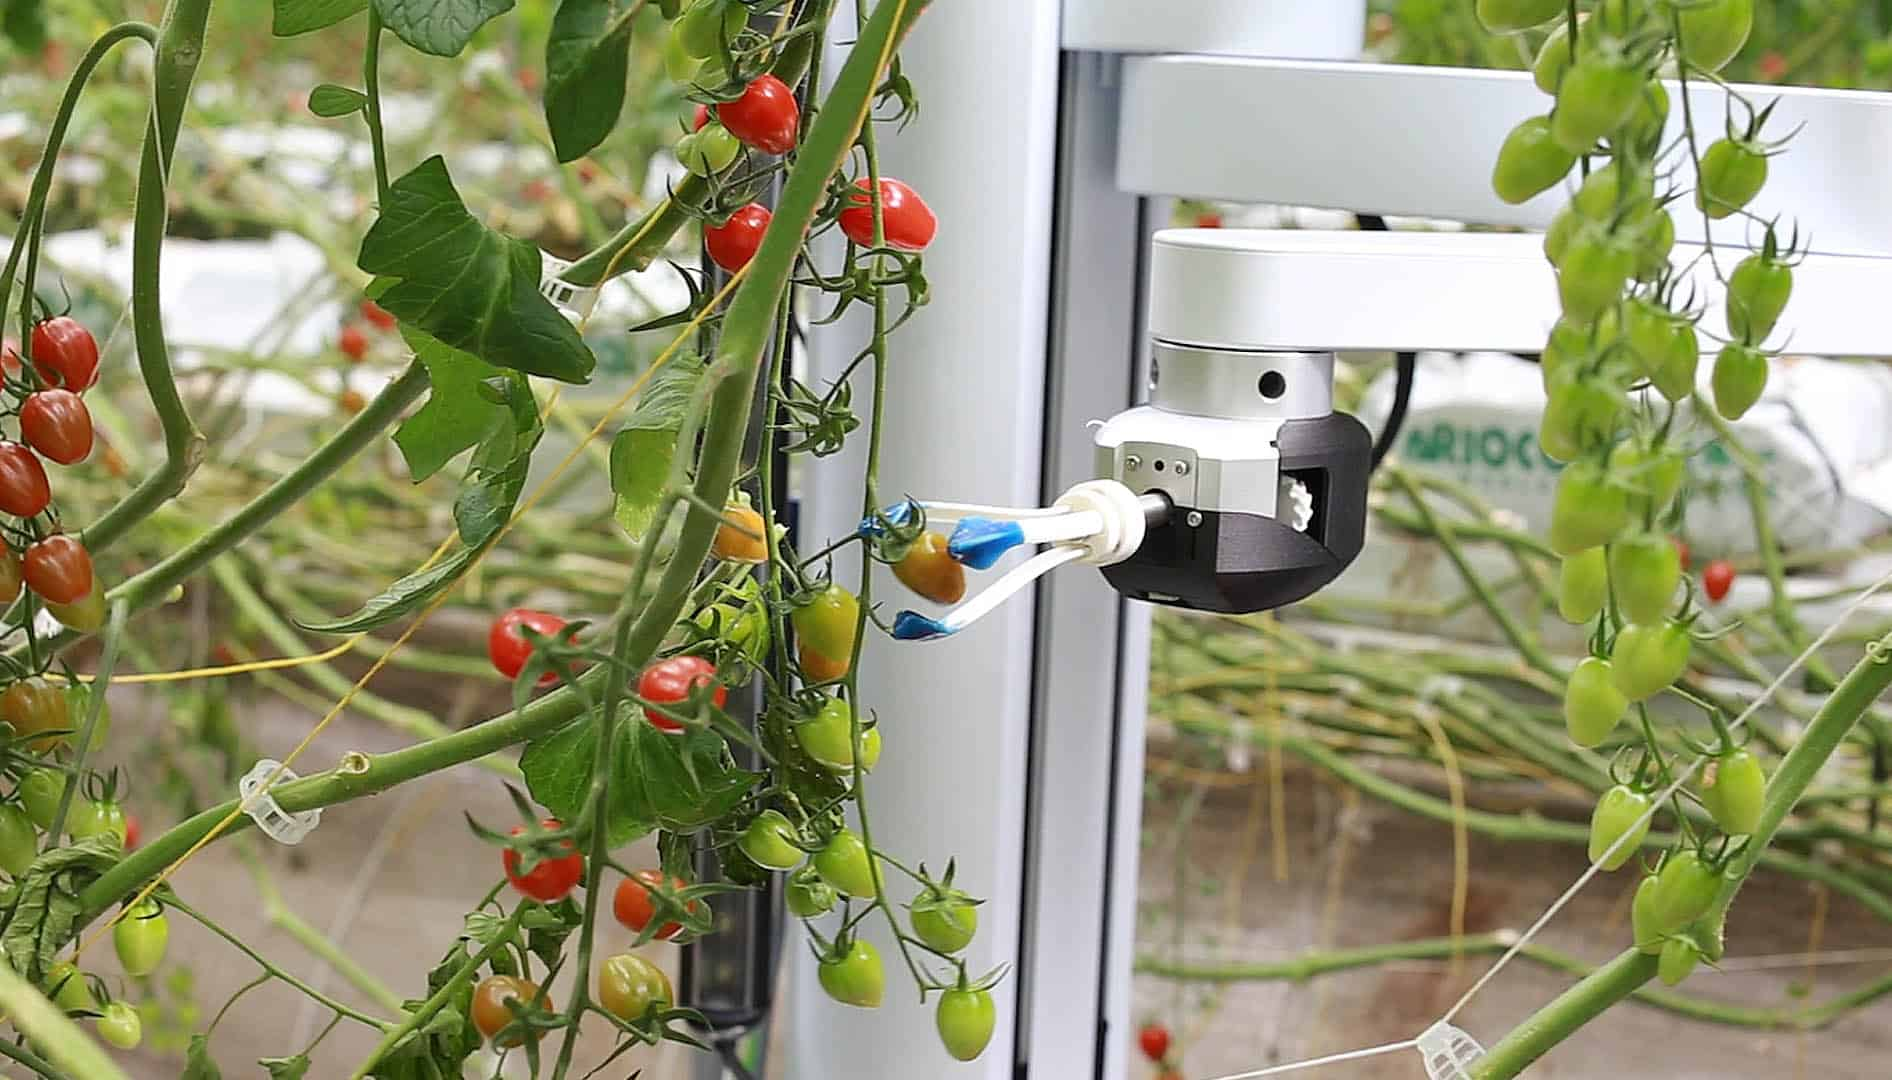 rootai plant robotics